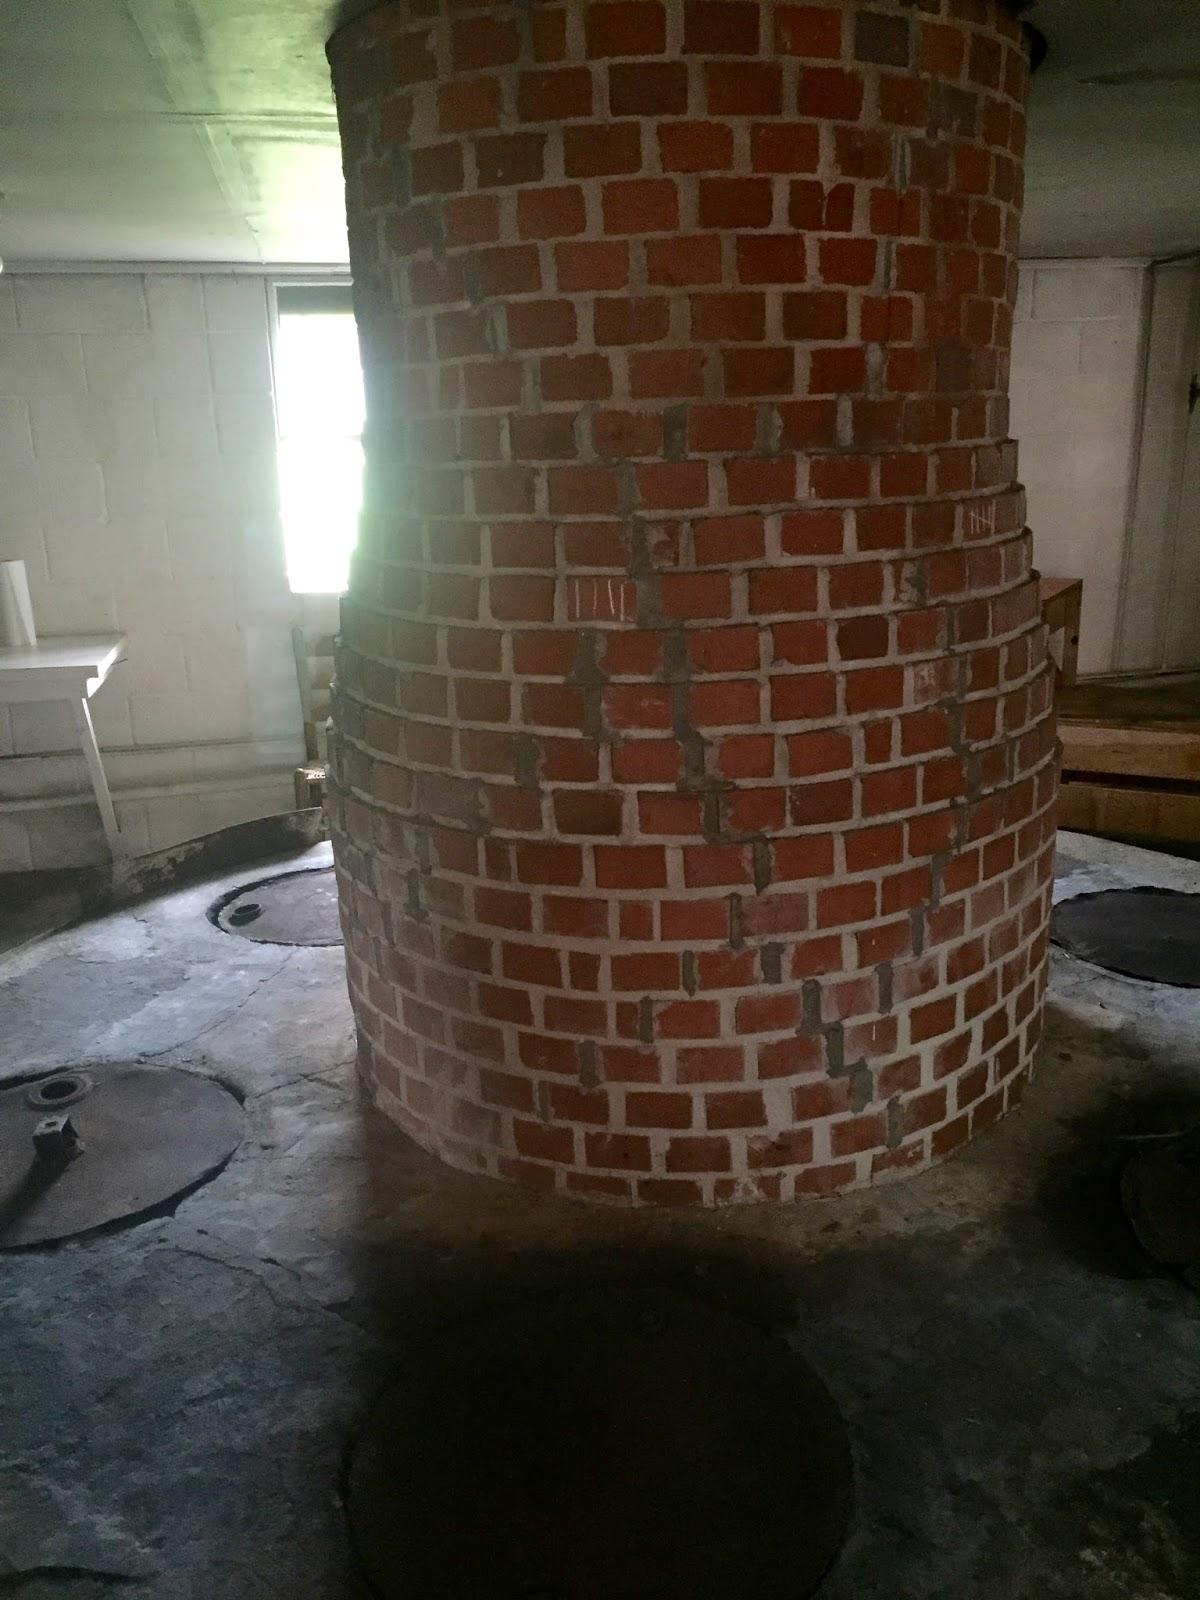 JOURNEYS of FAITH The Pot Pie House Bethel Claremont NC